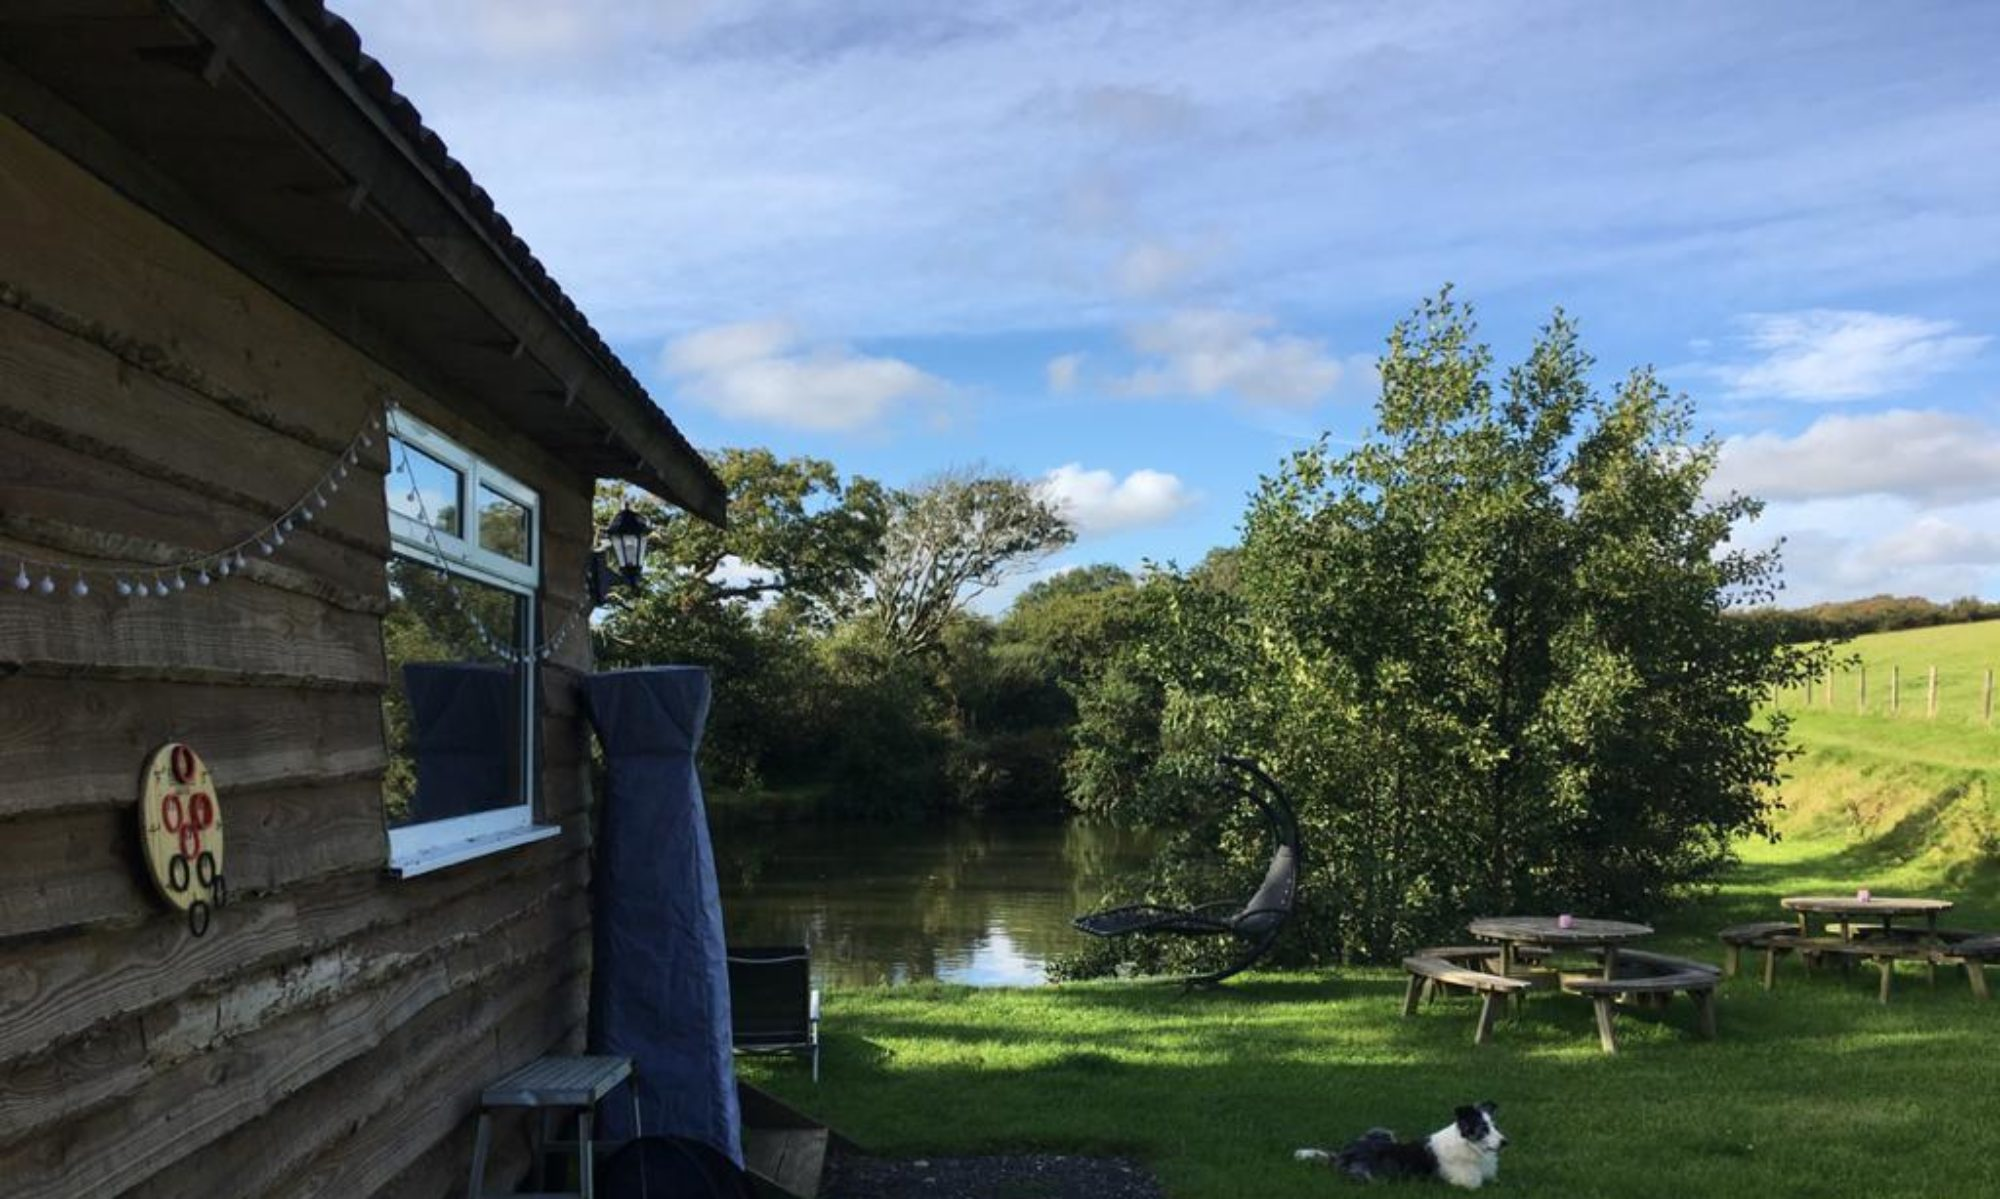 Pengelly Farm Cottages